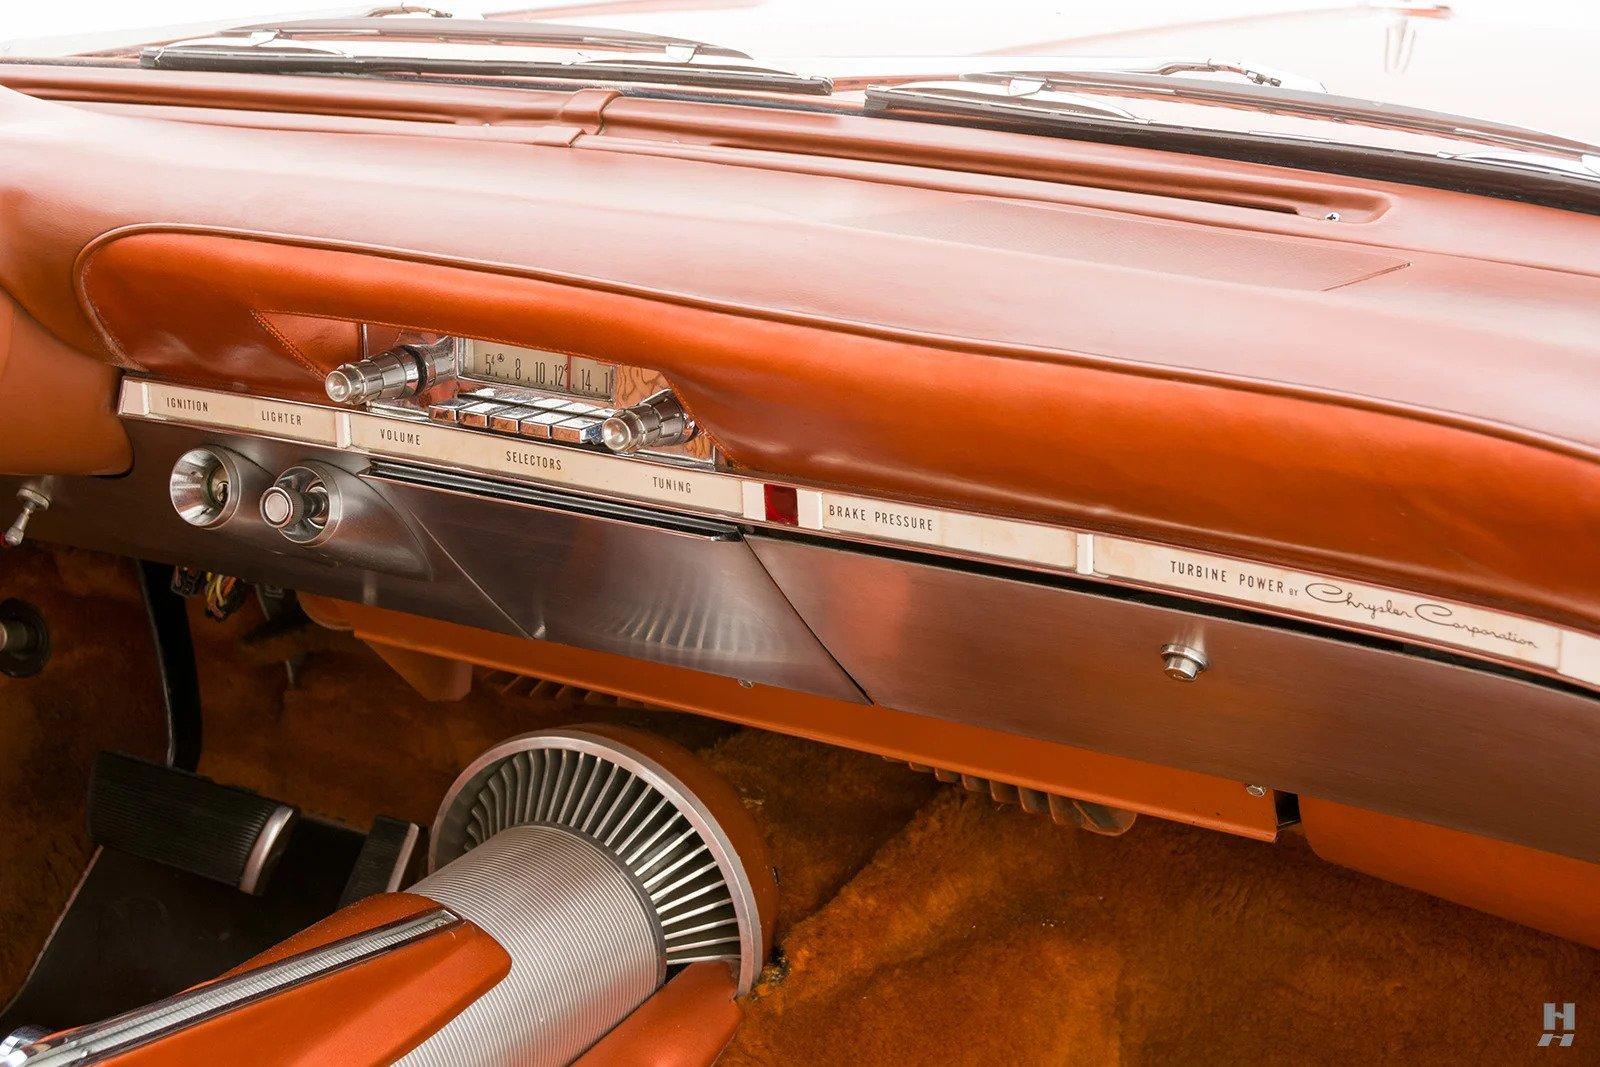 1963 Chrysler Turbine Car engine bay interior dash